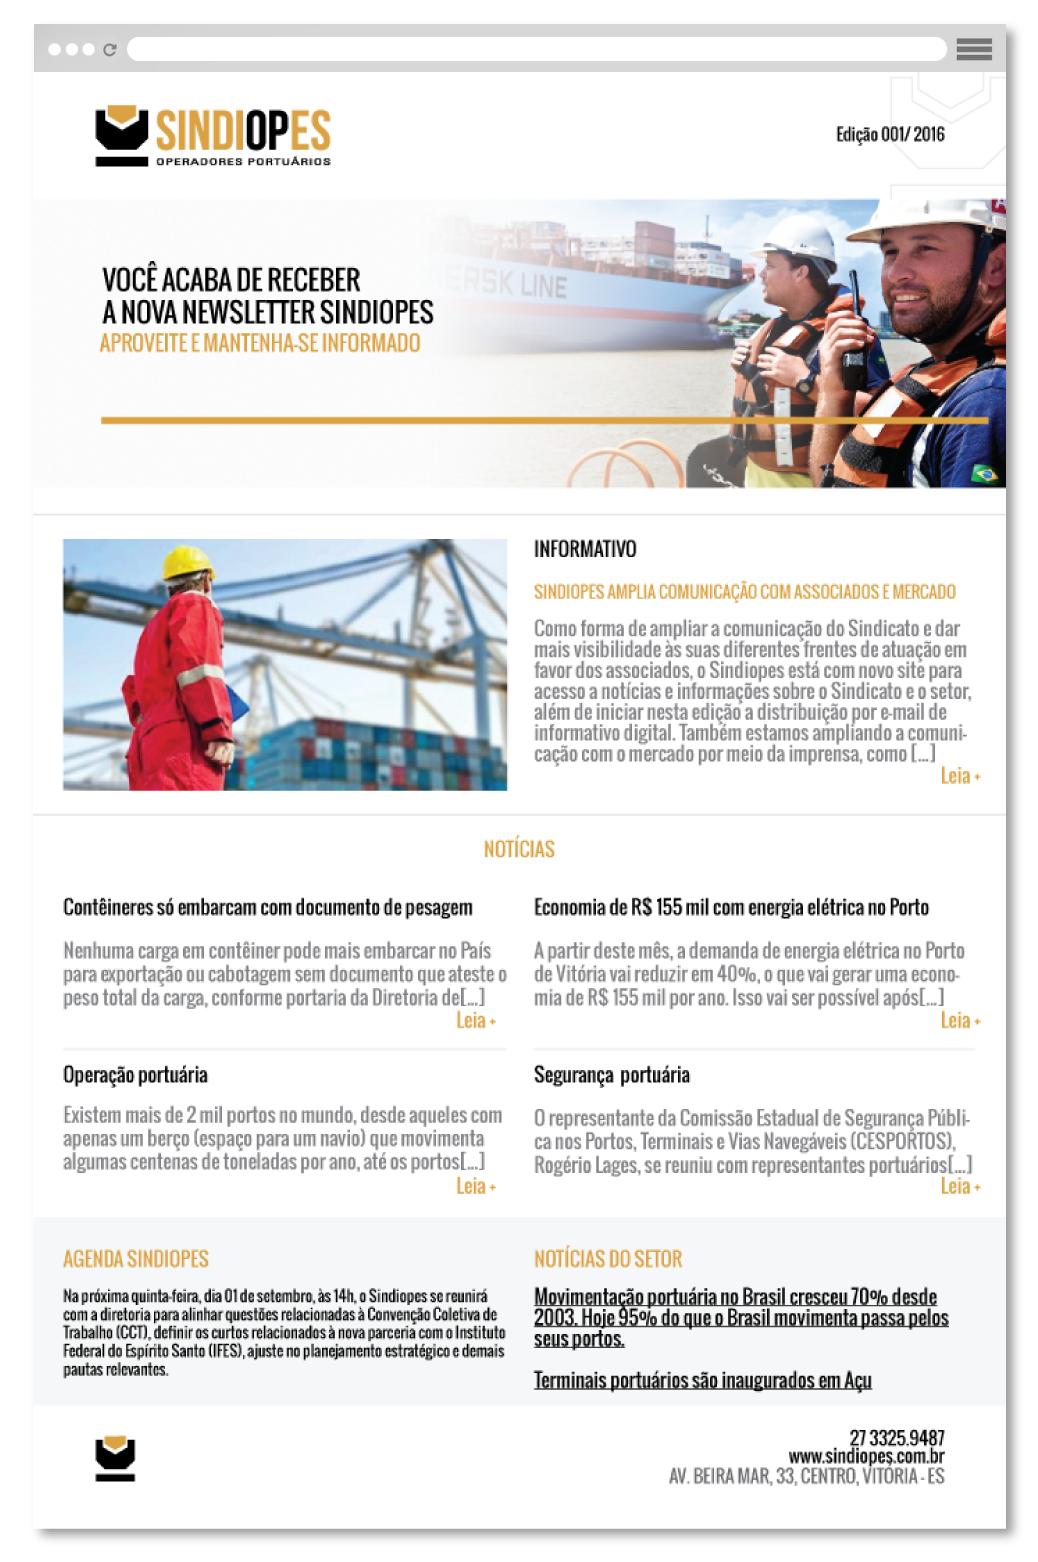 wce-site-novo-2016-portfolio-news-sindiopes-img1